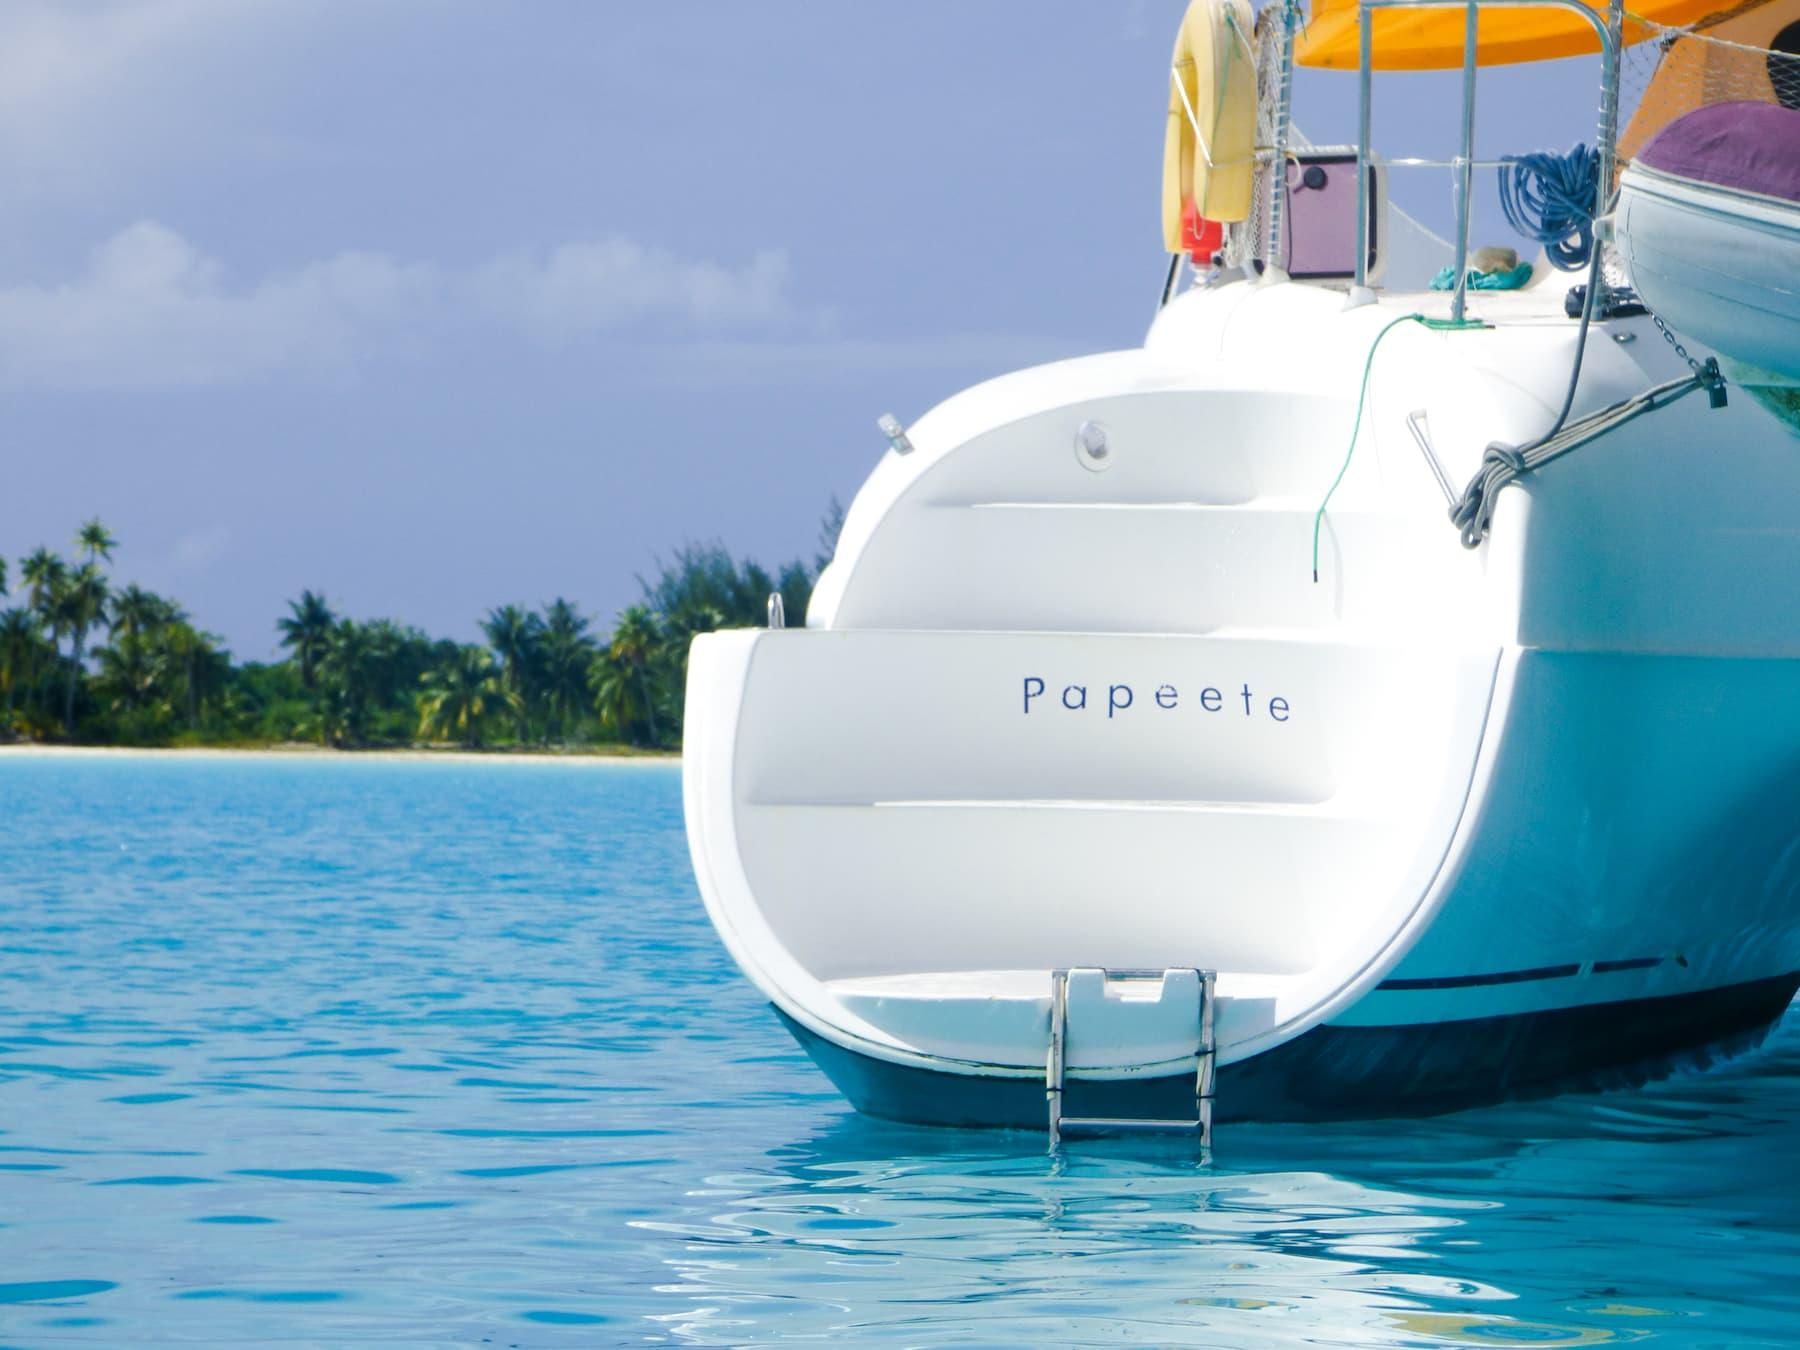 https://tahititourisme.mx/wp-content/uploads/2017/08/bateau-tlc-modif-12.jpg